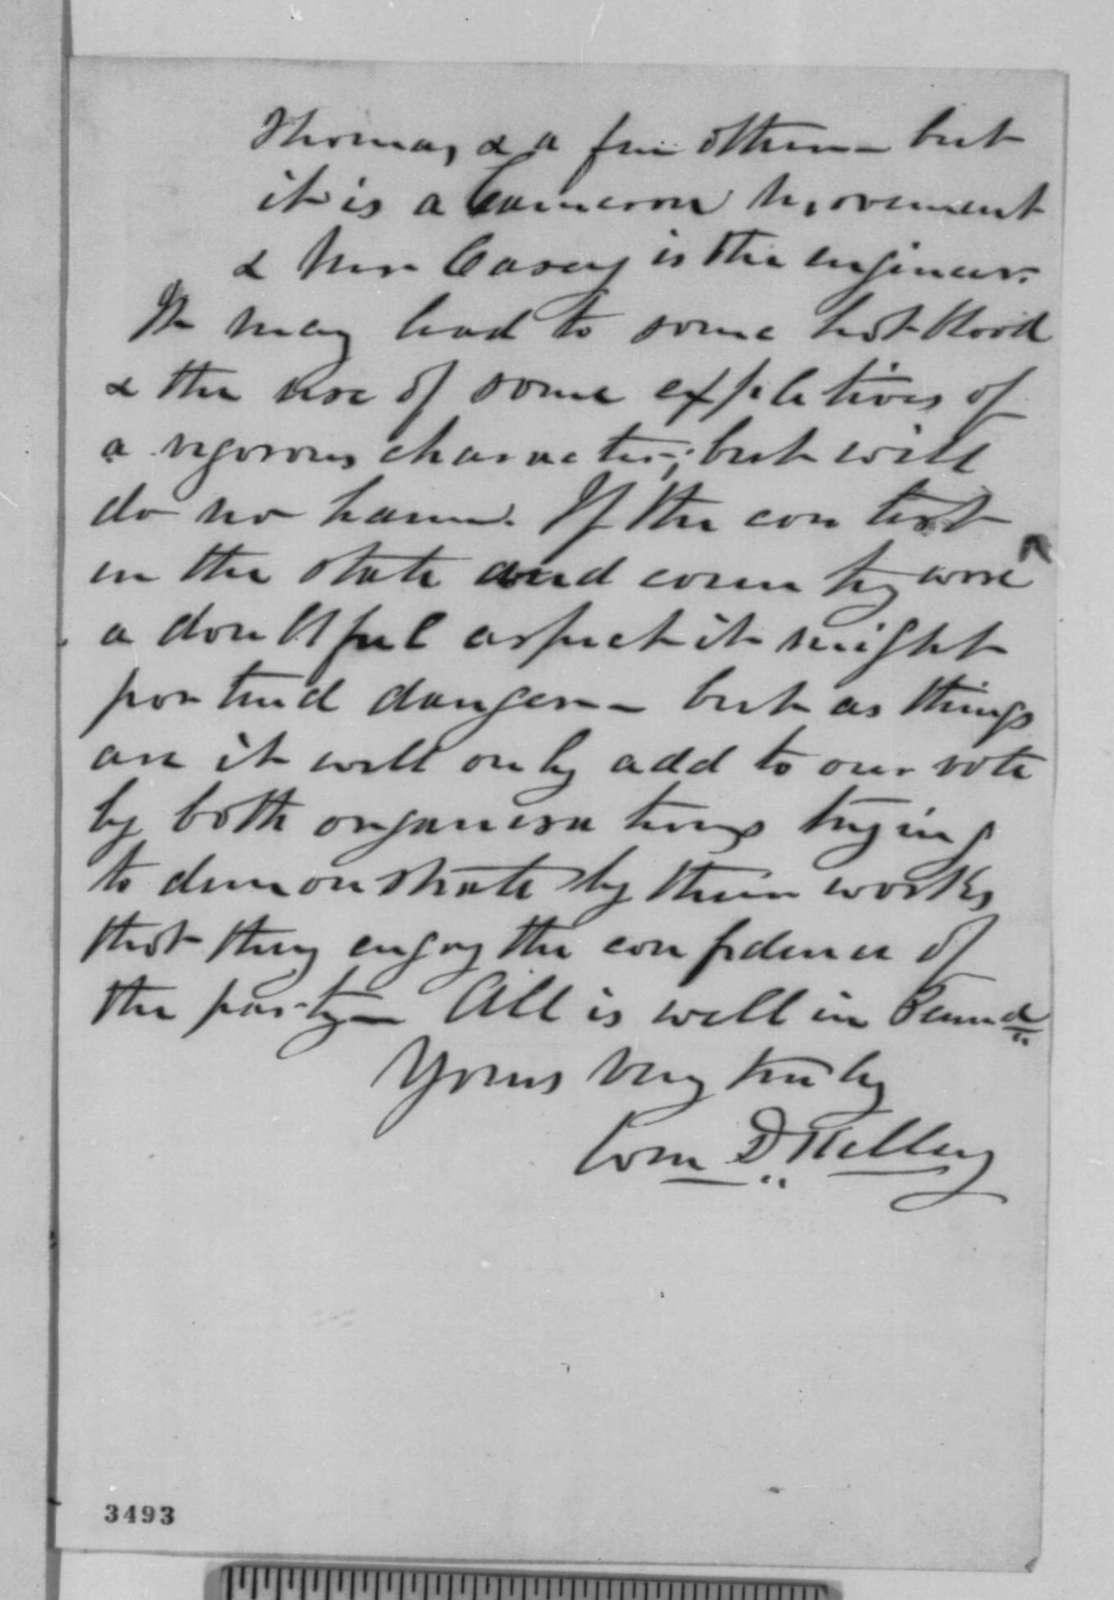 William D. Kelley to Norman B. Judd, Wednesday, August 08, 1860  (Politics in Pennsylvania)